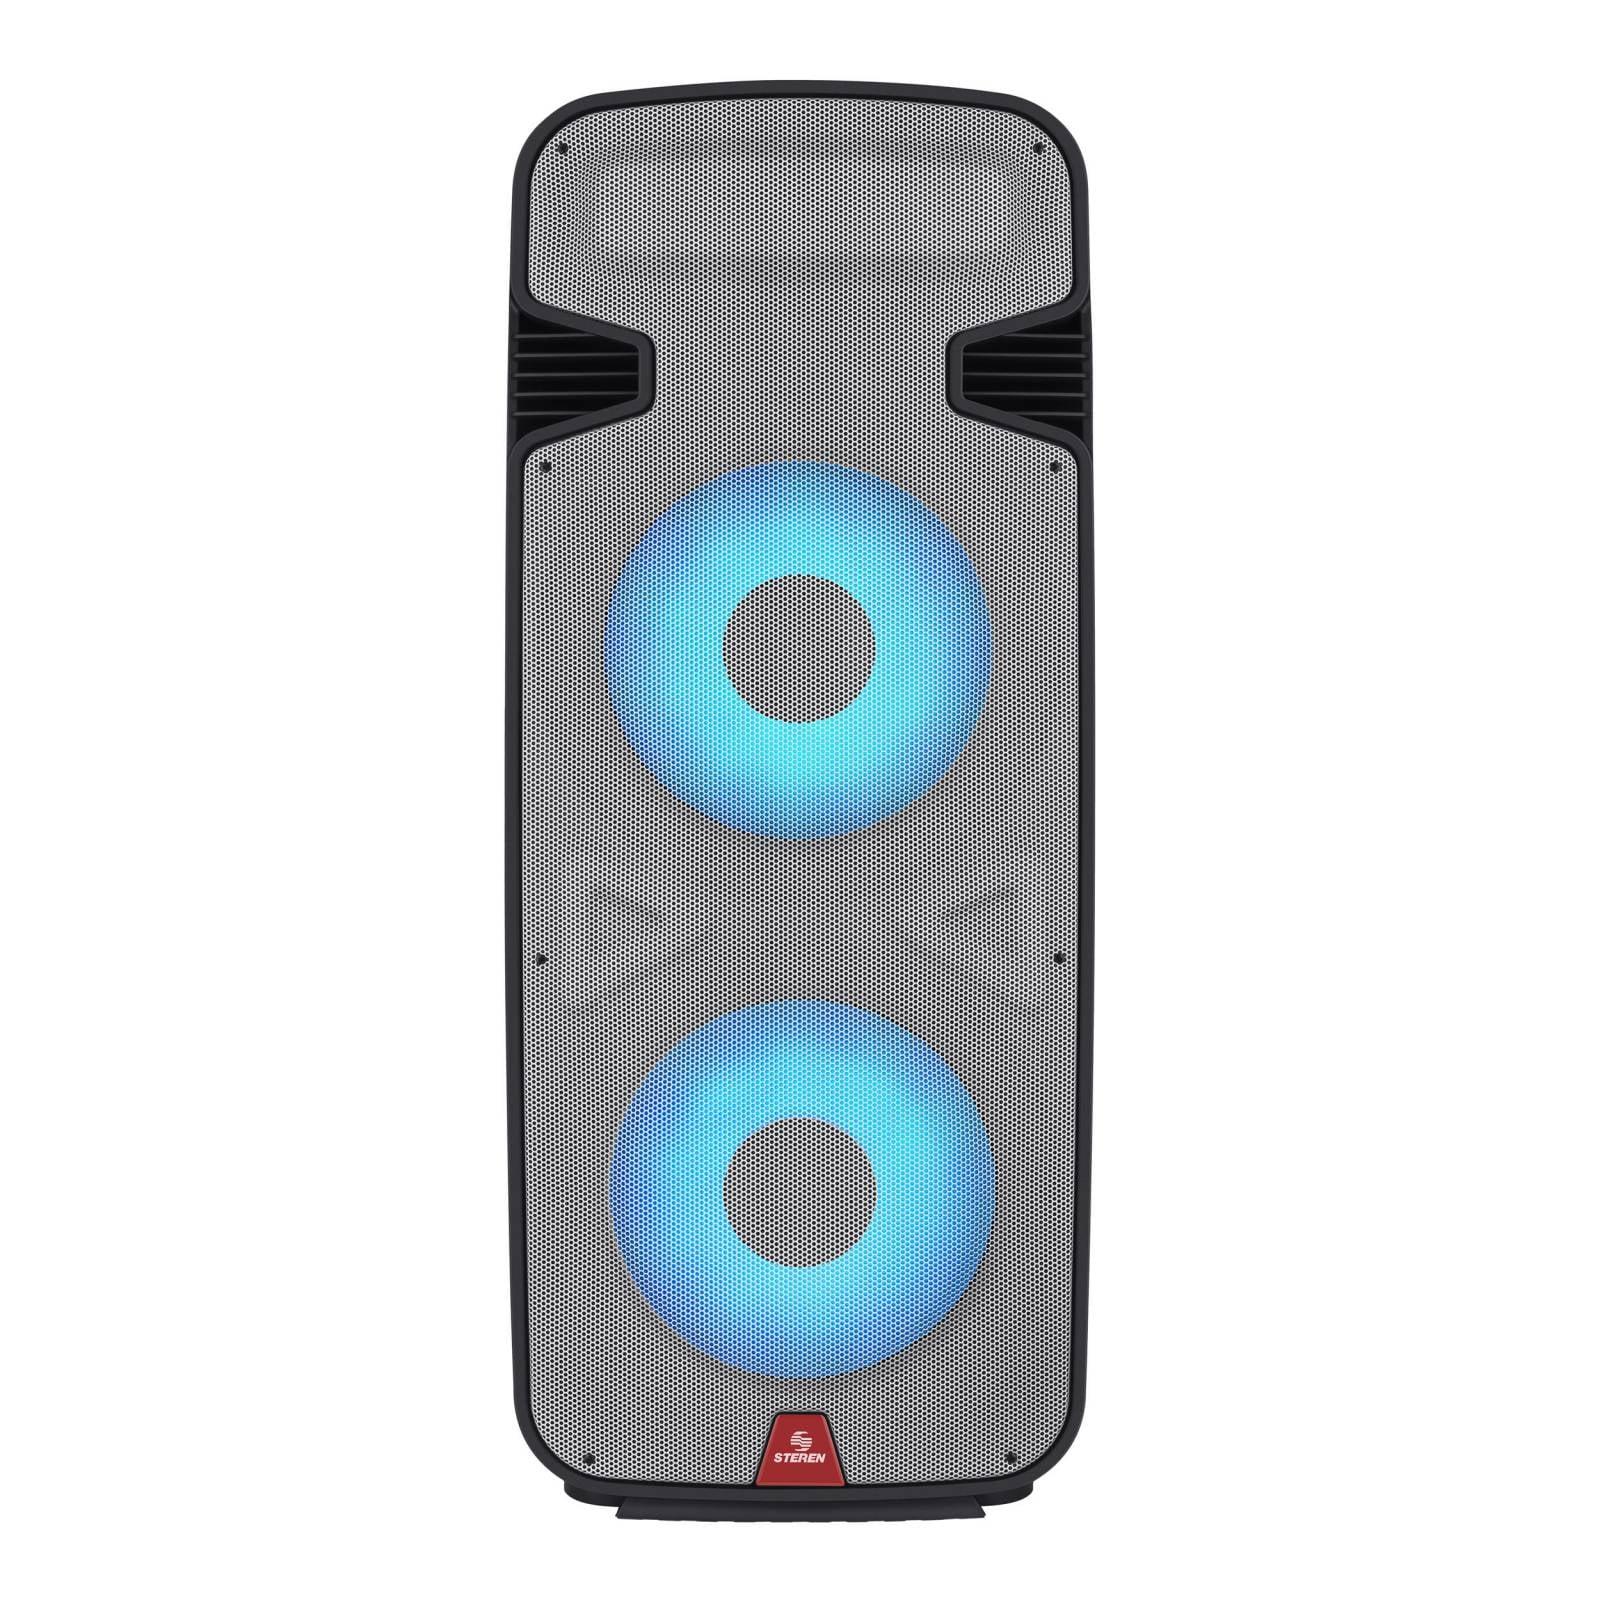 "Bafle profesional Bluetooth doble, de 15"" con luz LED, 6000 WPMPO"